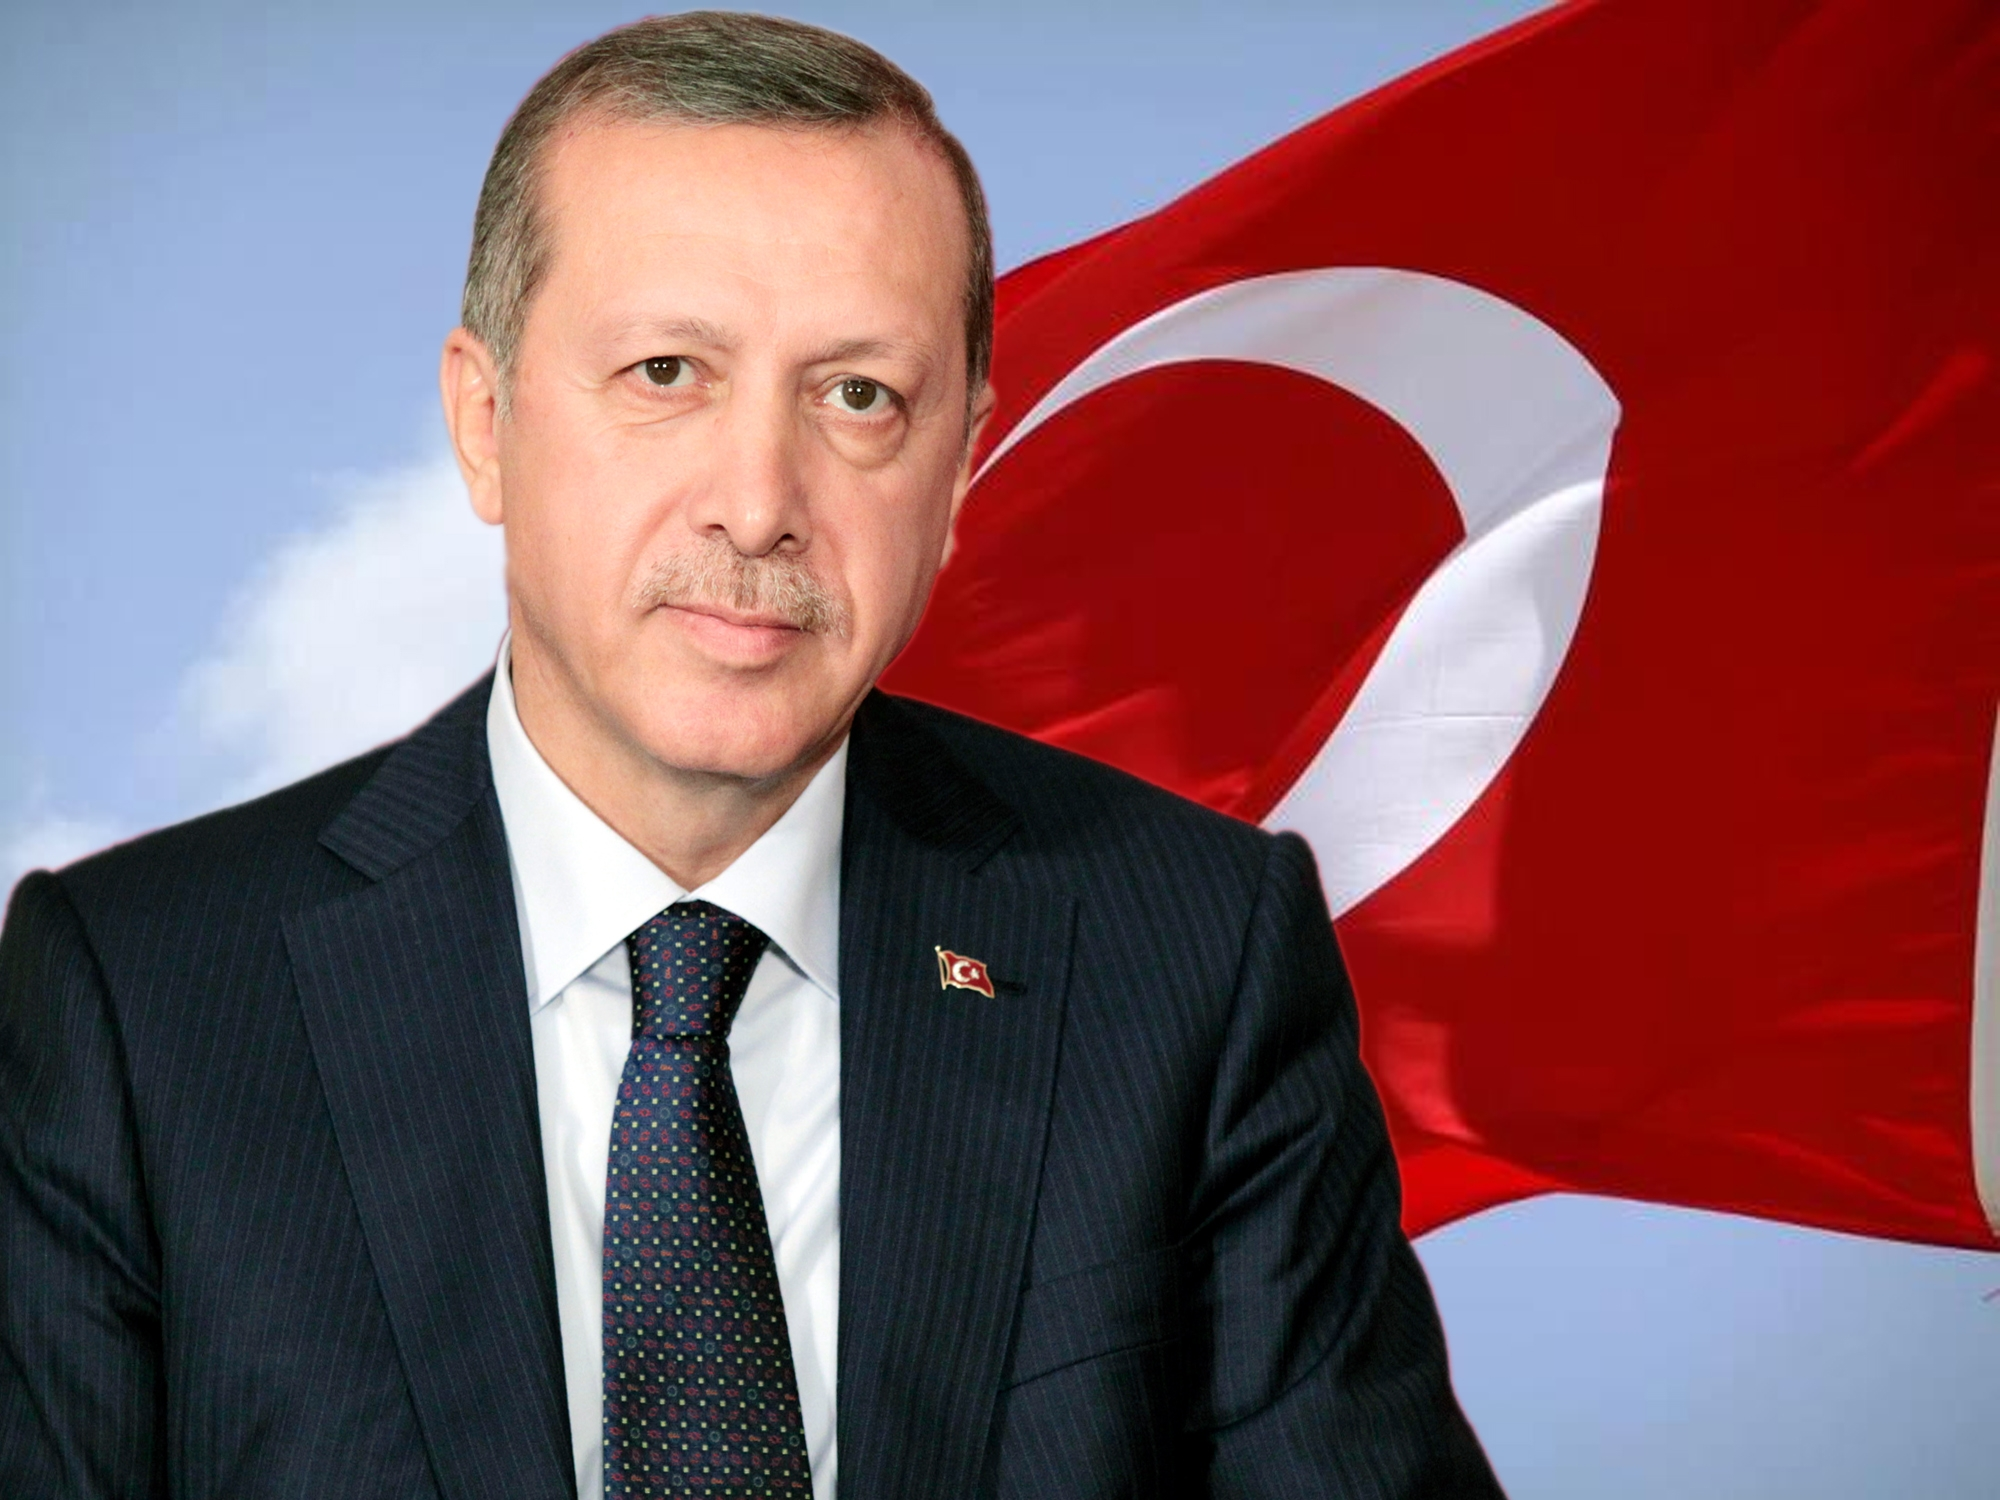 Recep Tayyip Erdoğan Biography Childhood Life Achievements & Timeline